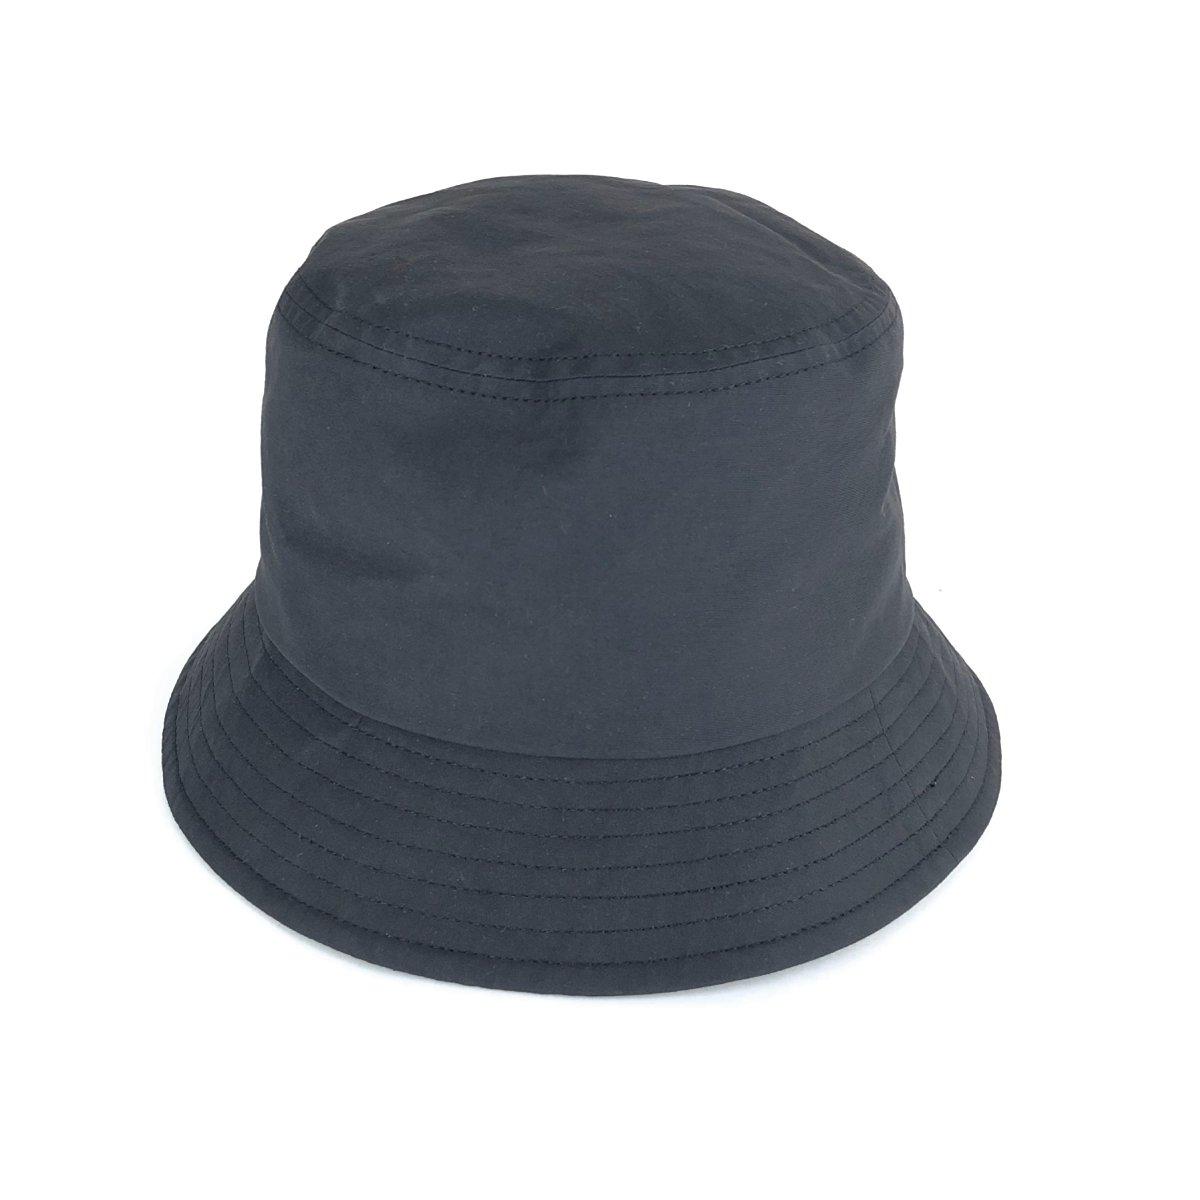 Genius BK Hat 詳細画像3